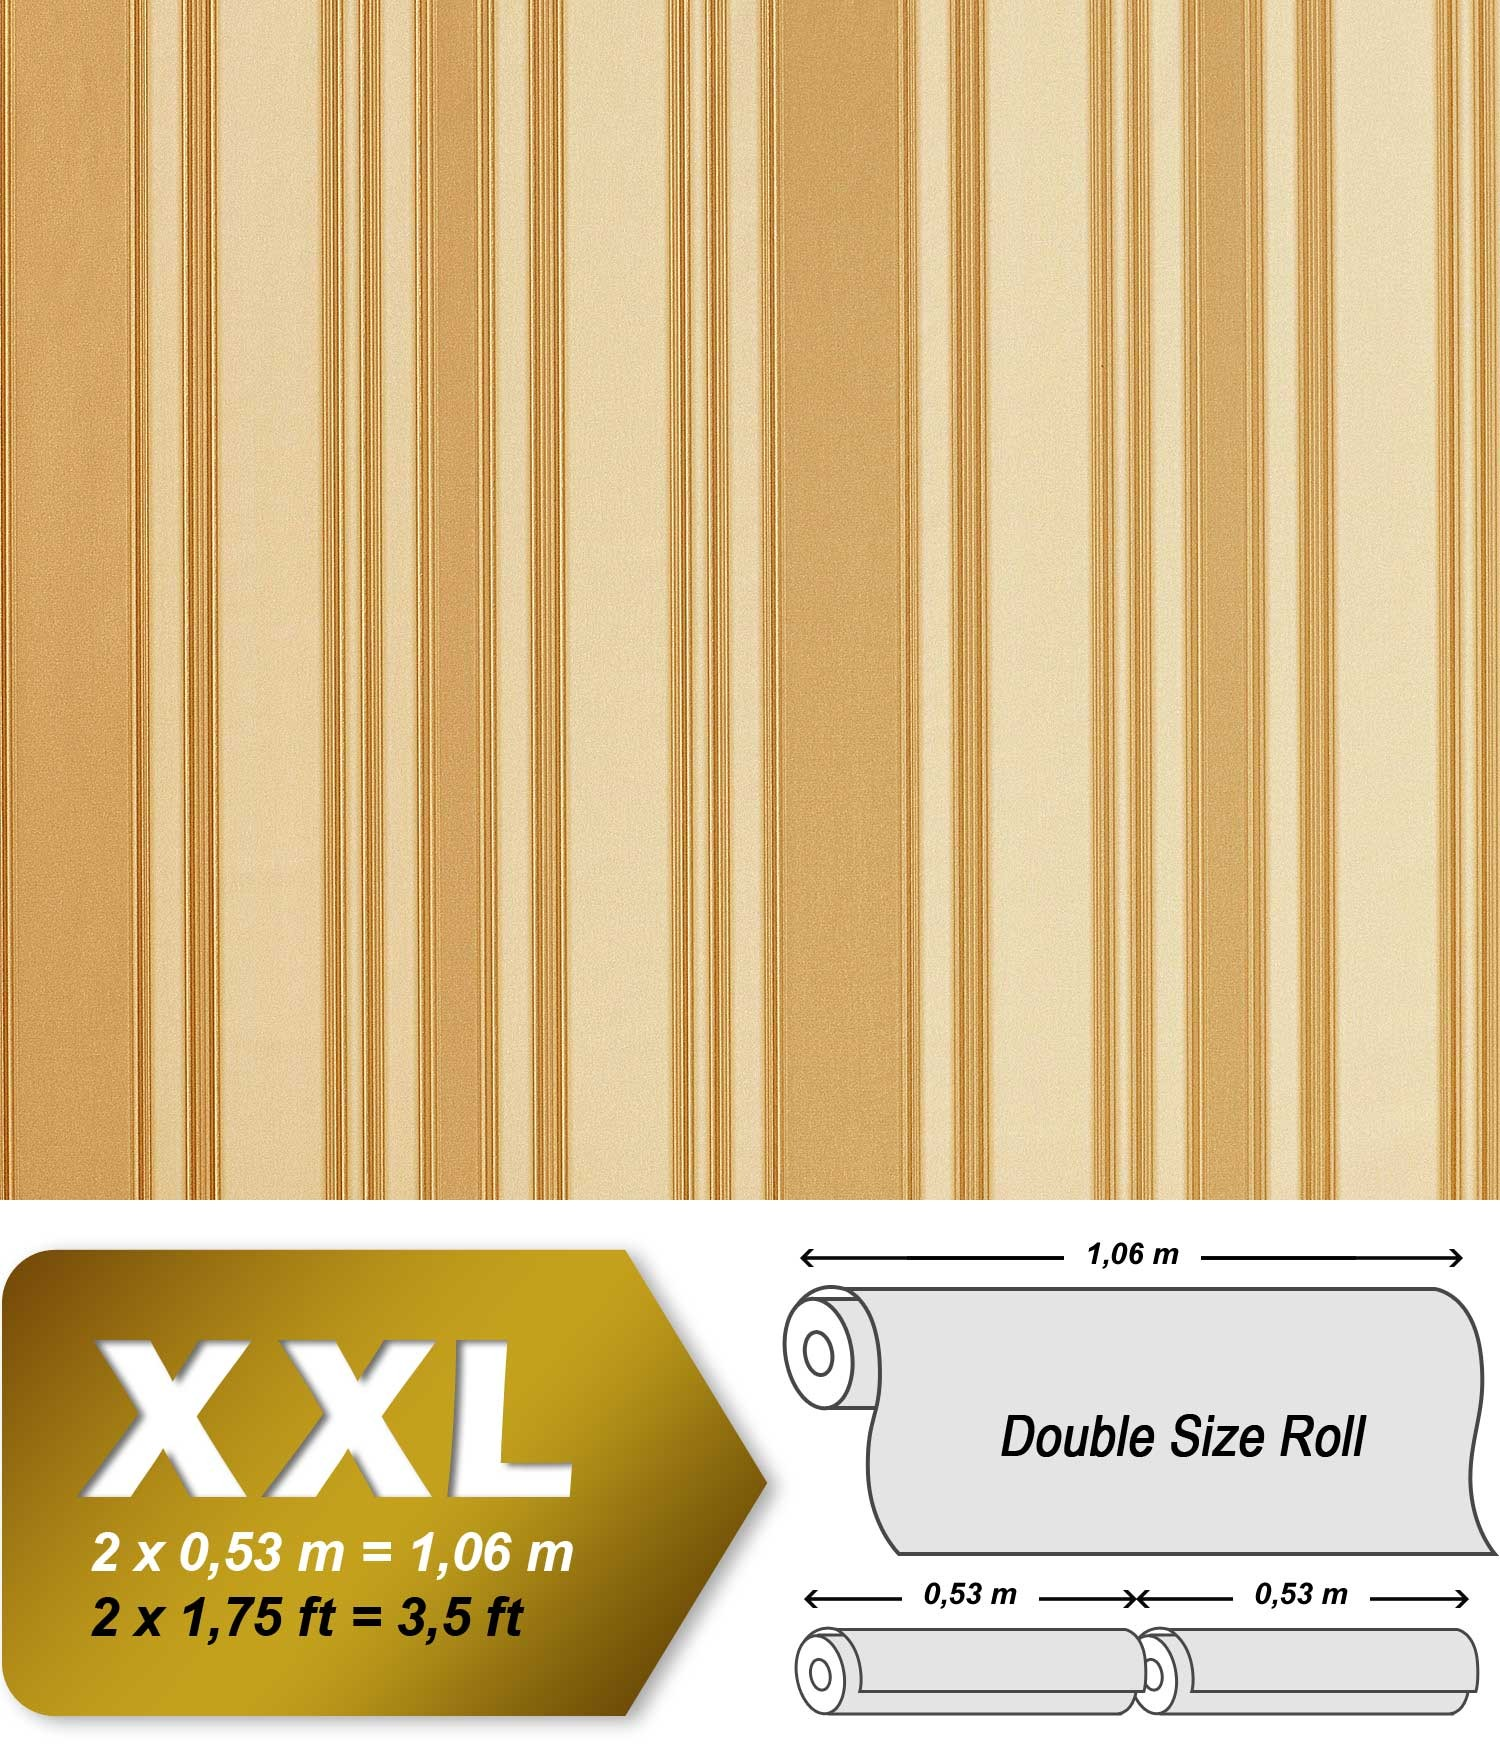 Xxl papier peint de luxe edem 980 32 intiss relief motif rayures n obaroque beige cr me caramel for Papier peint luxe